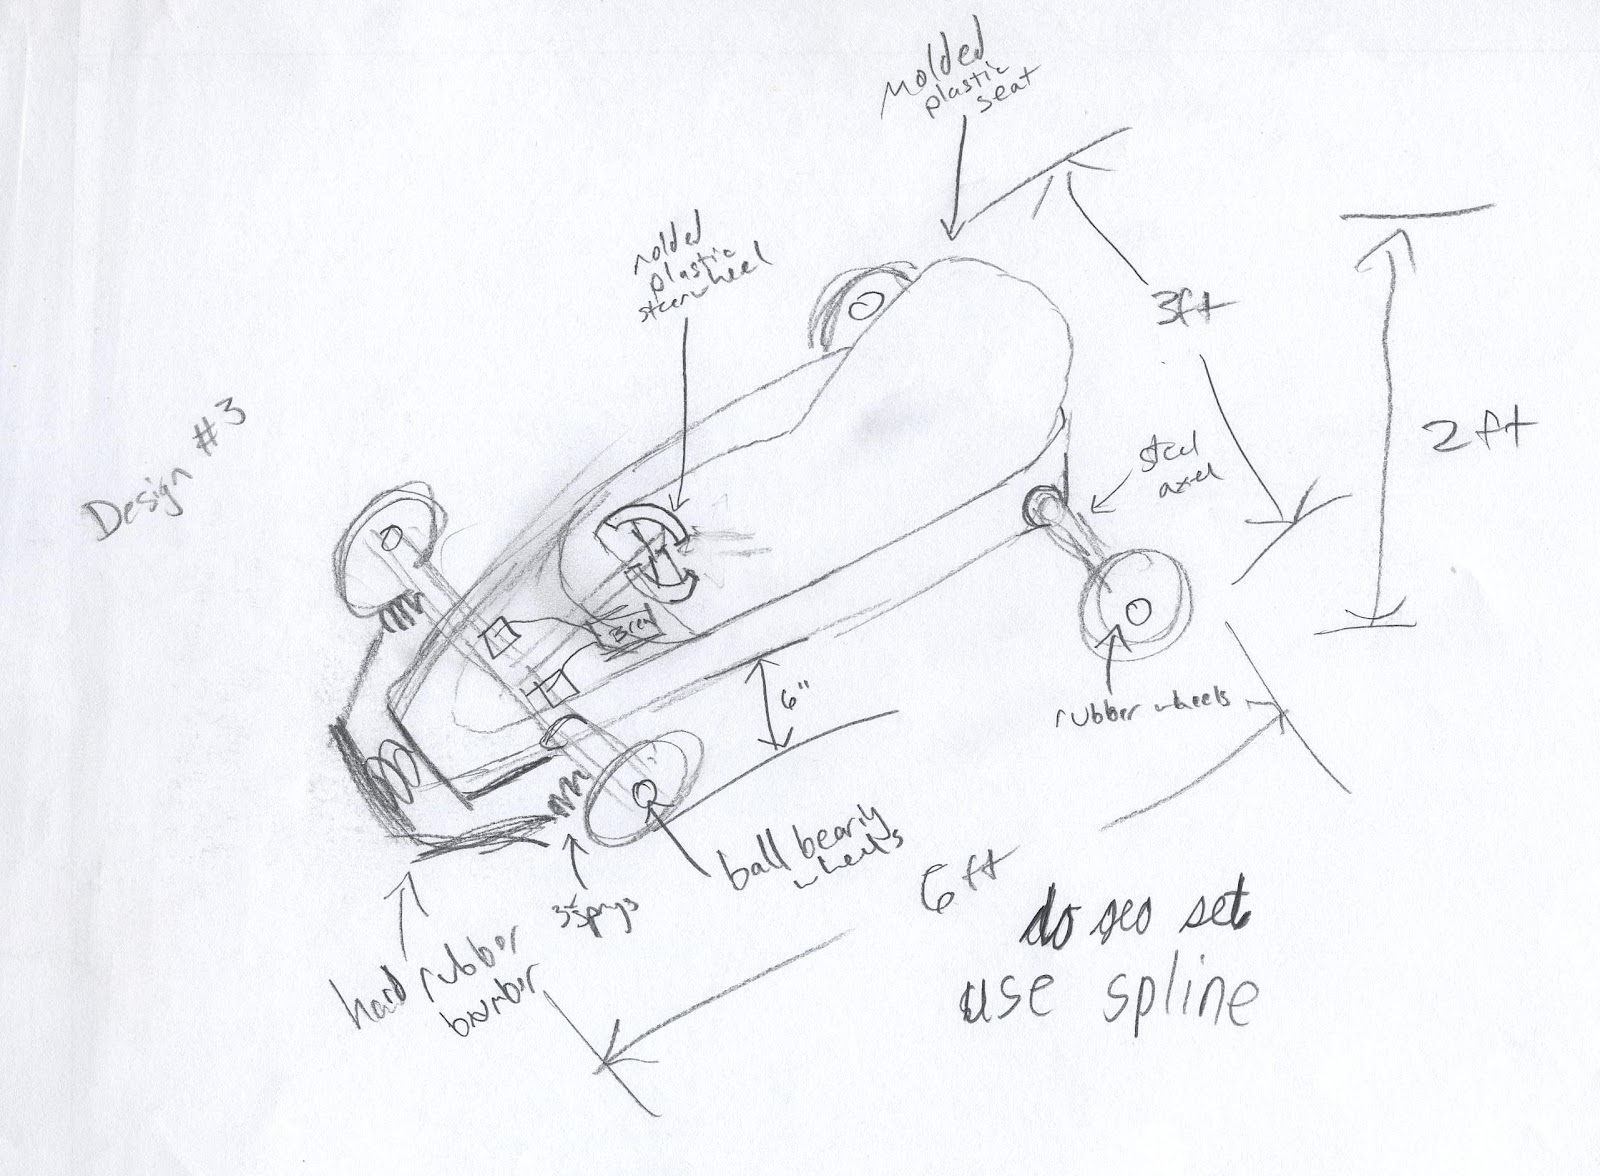 engineering design process part 2